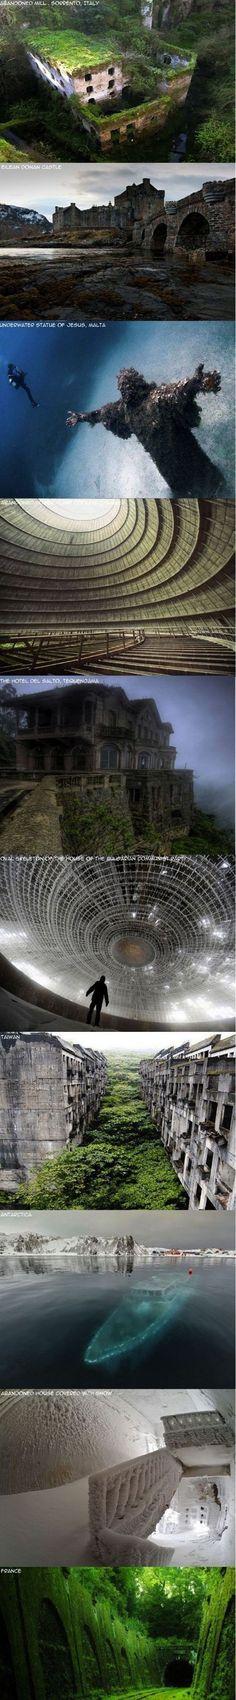 Faszinierende verlassene Orte